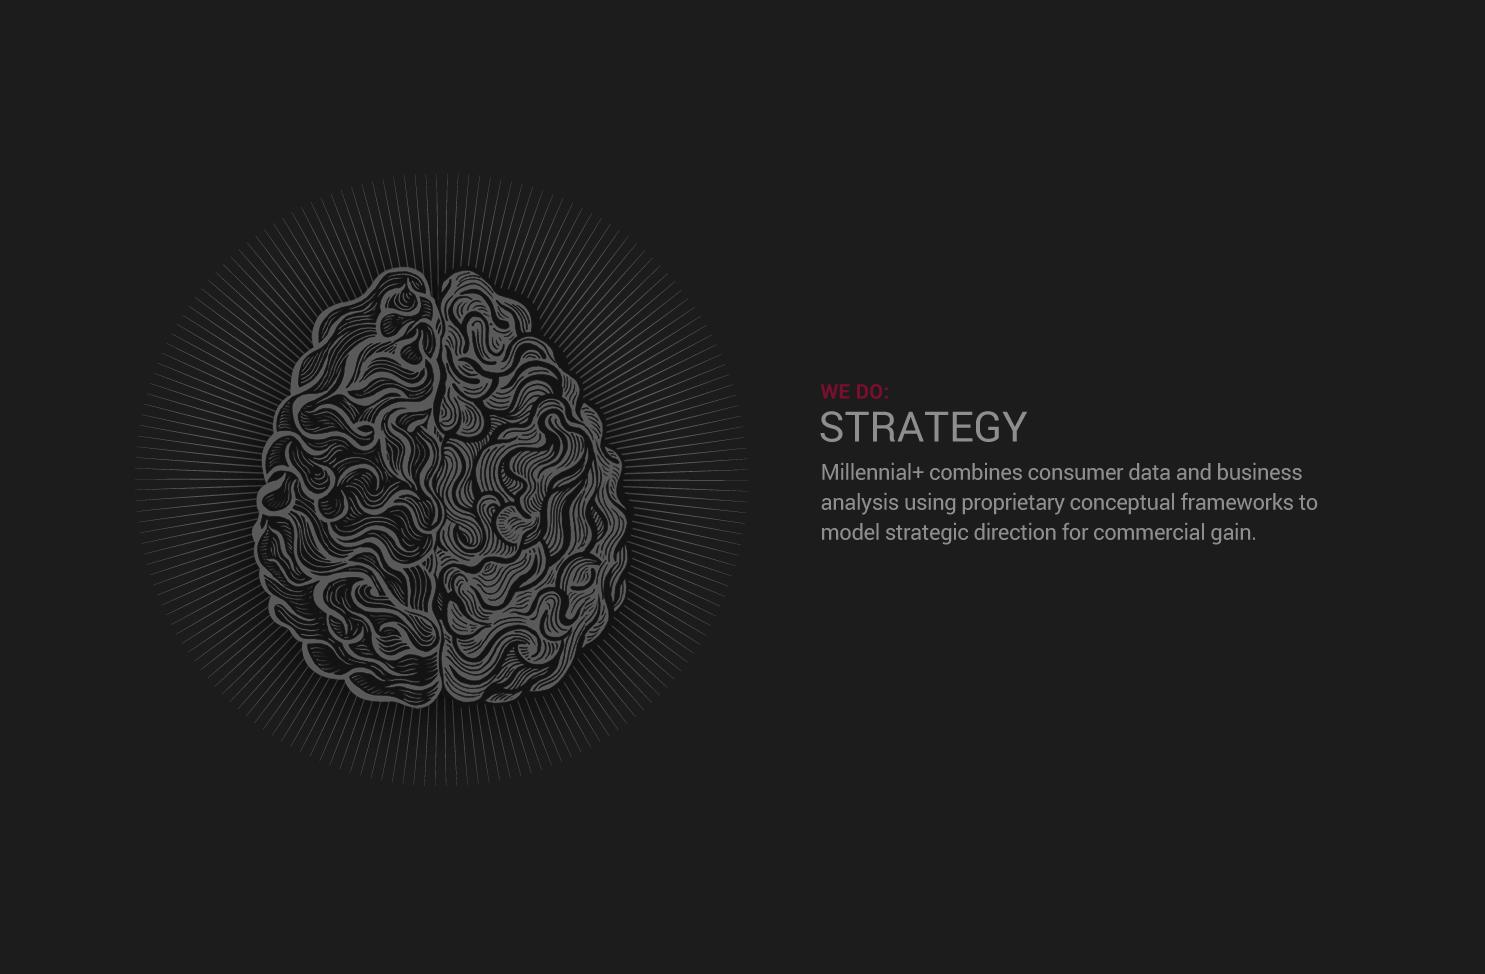 3_strategy_brain.jpg